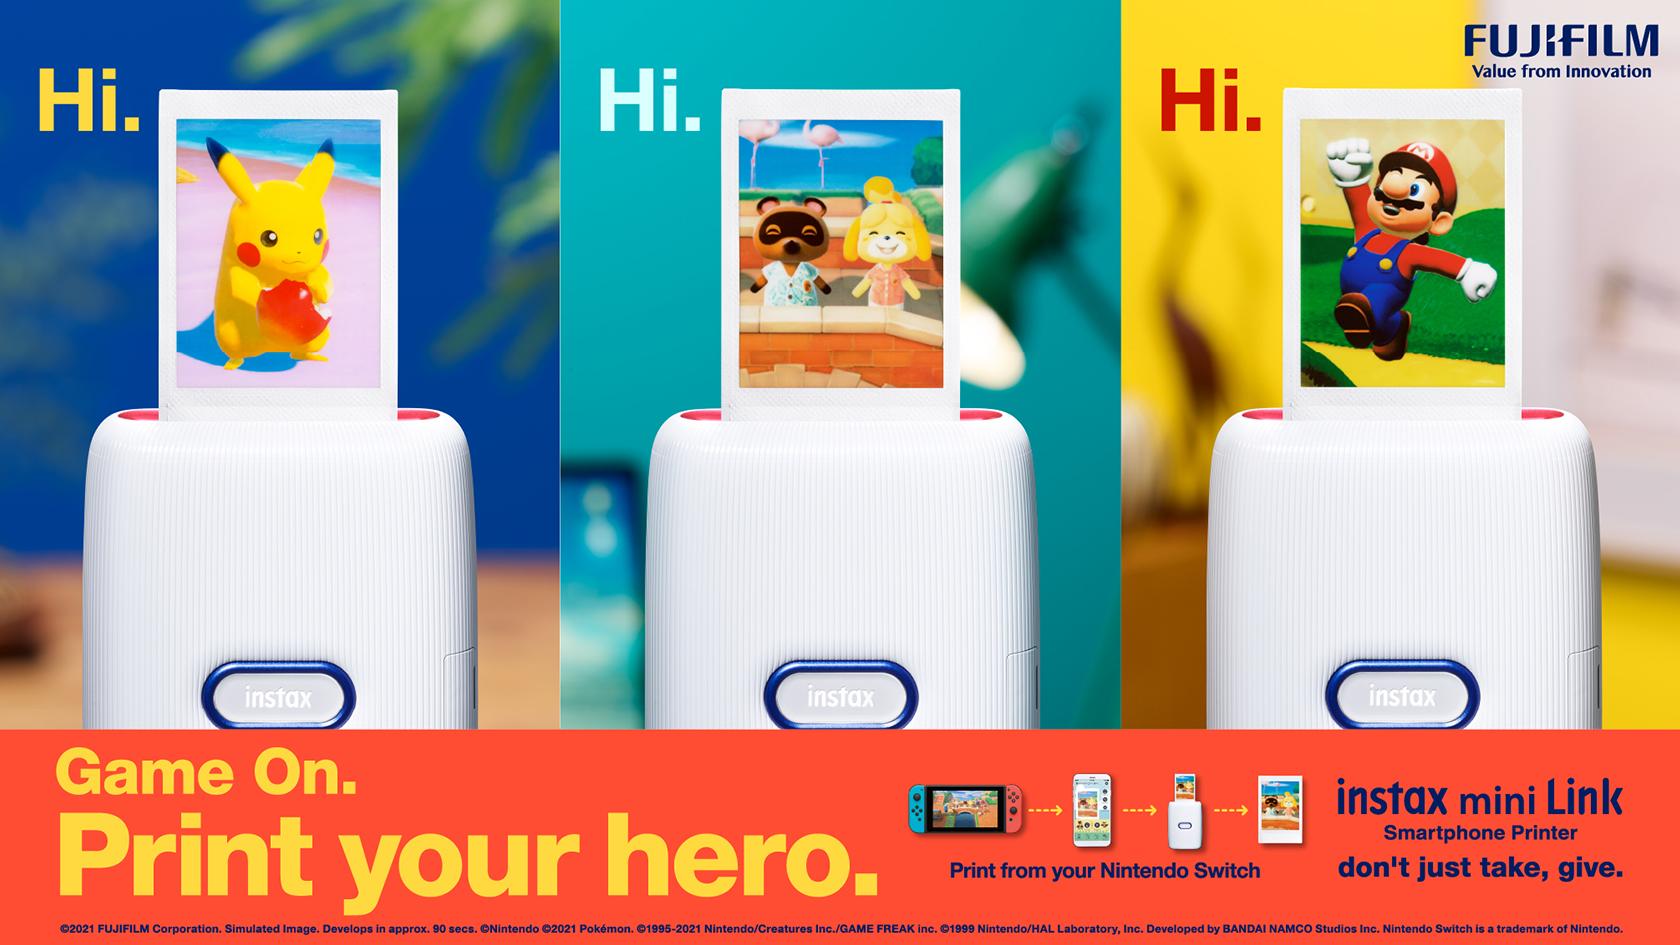 [image]Game On. Print your hero.